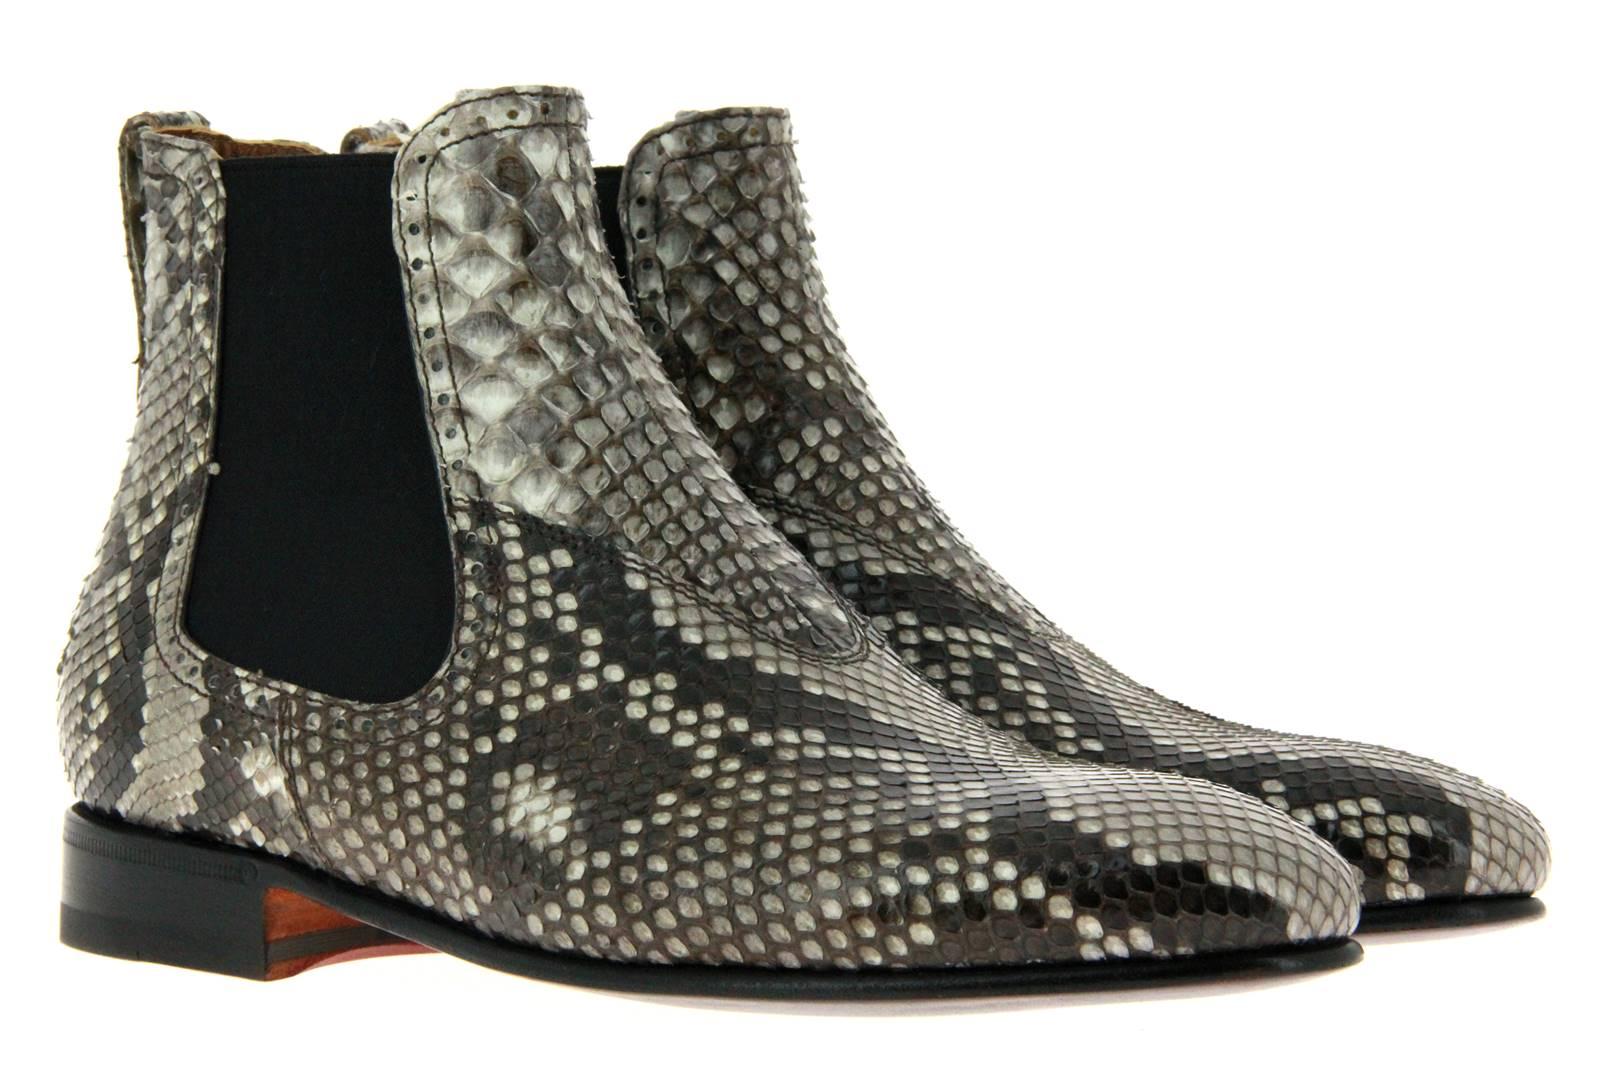 Benson's Chelsea boot ACAPULCO ROCCIA